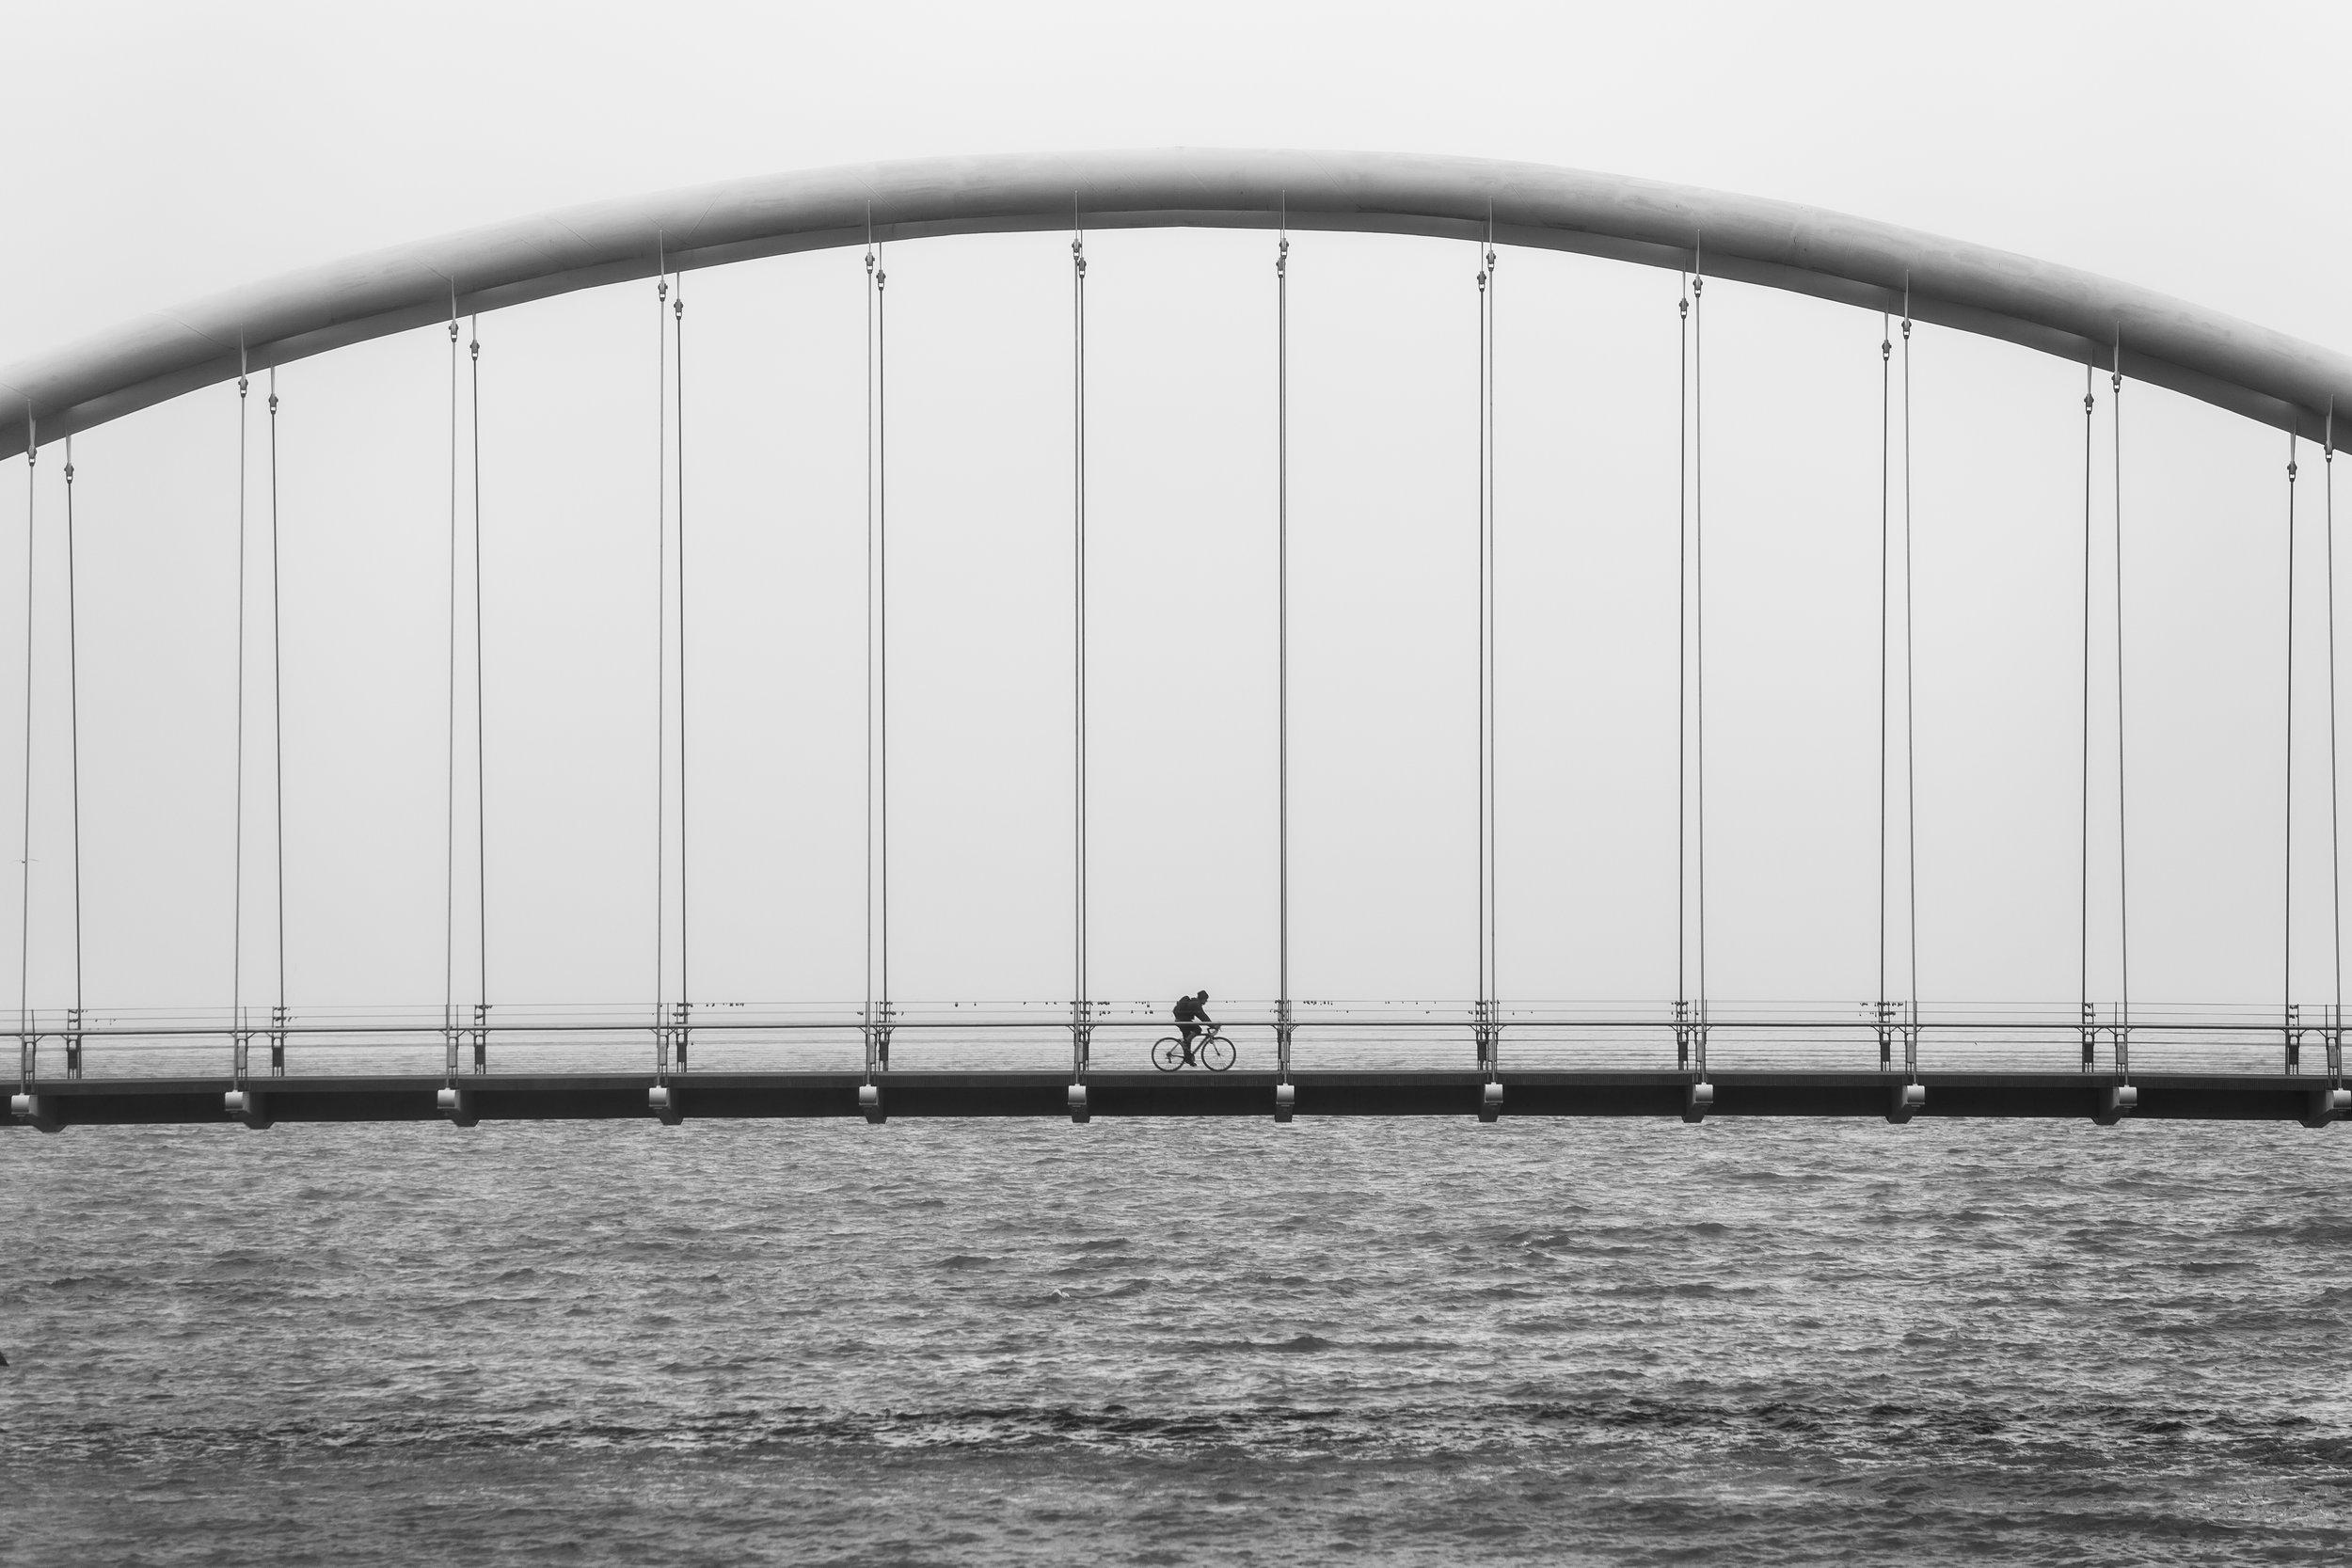 sea-black-and-white-bridge-suspension-bridge.jpeg